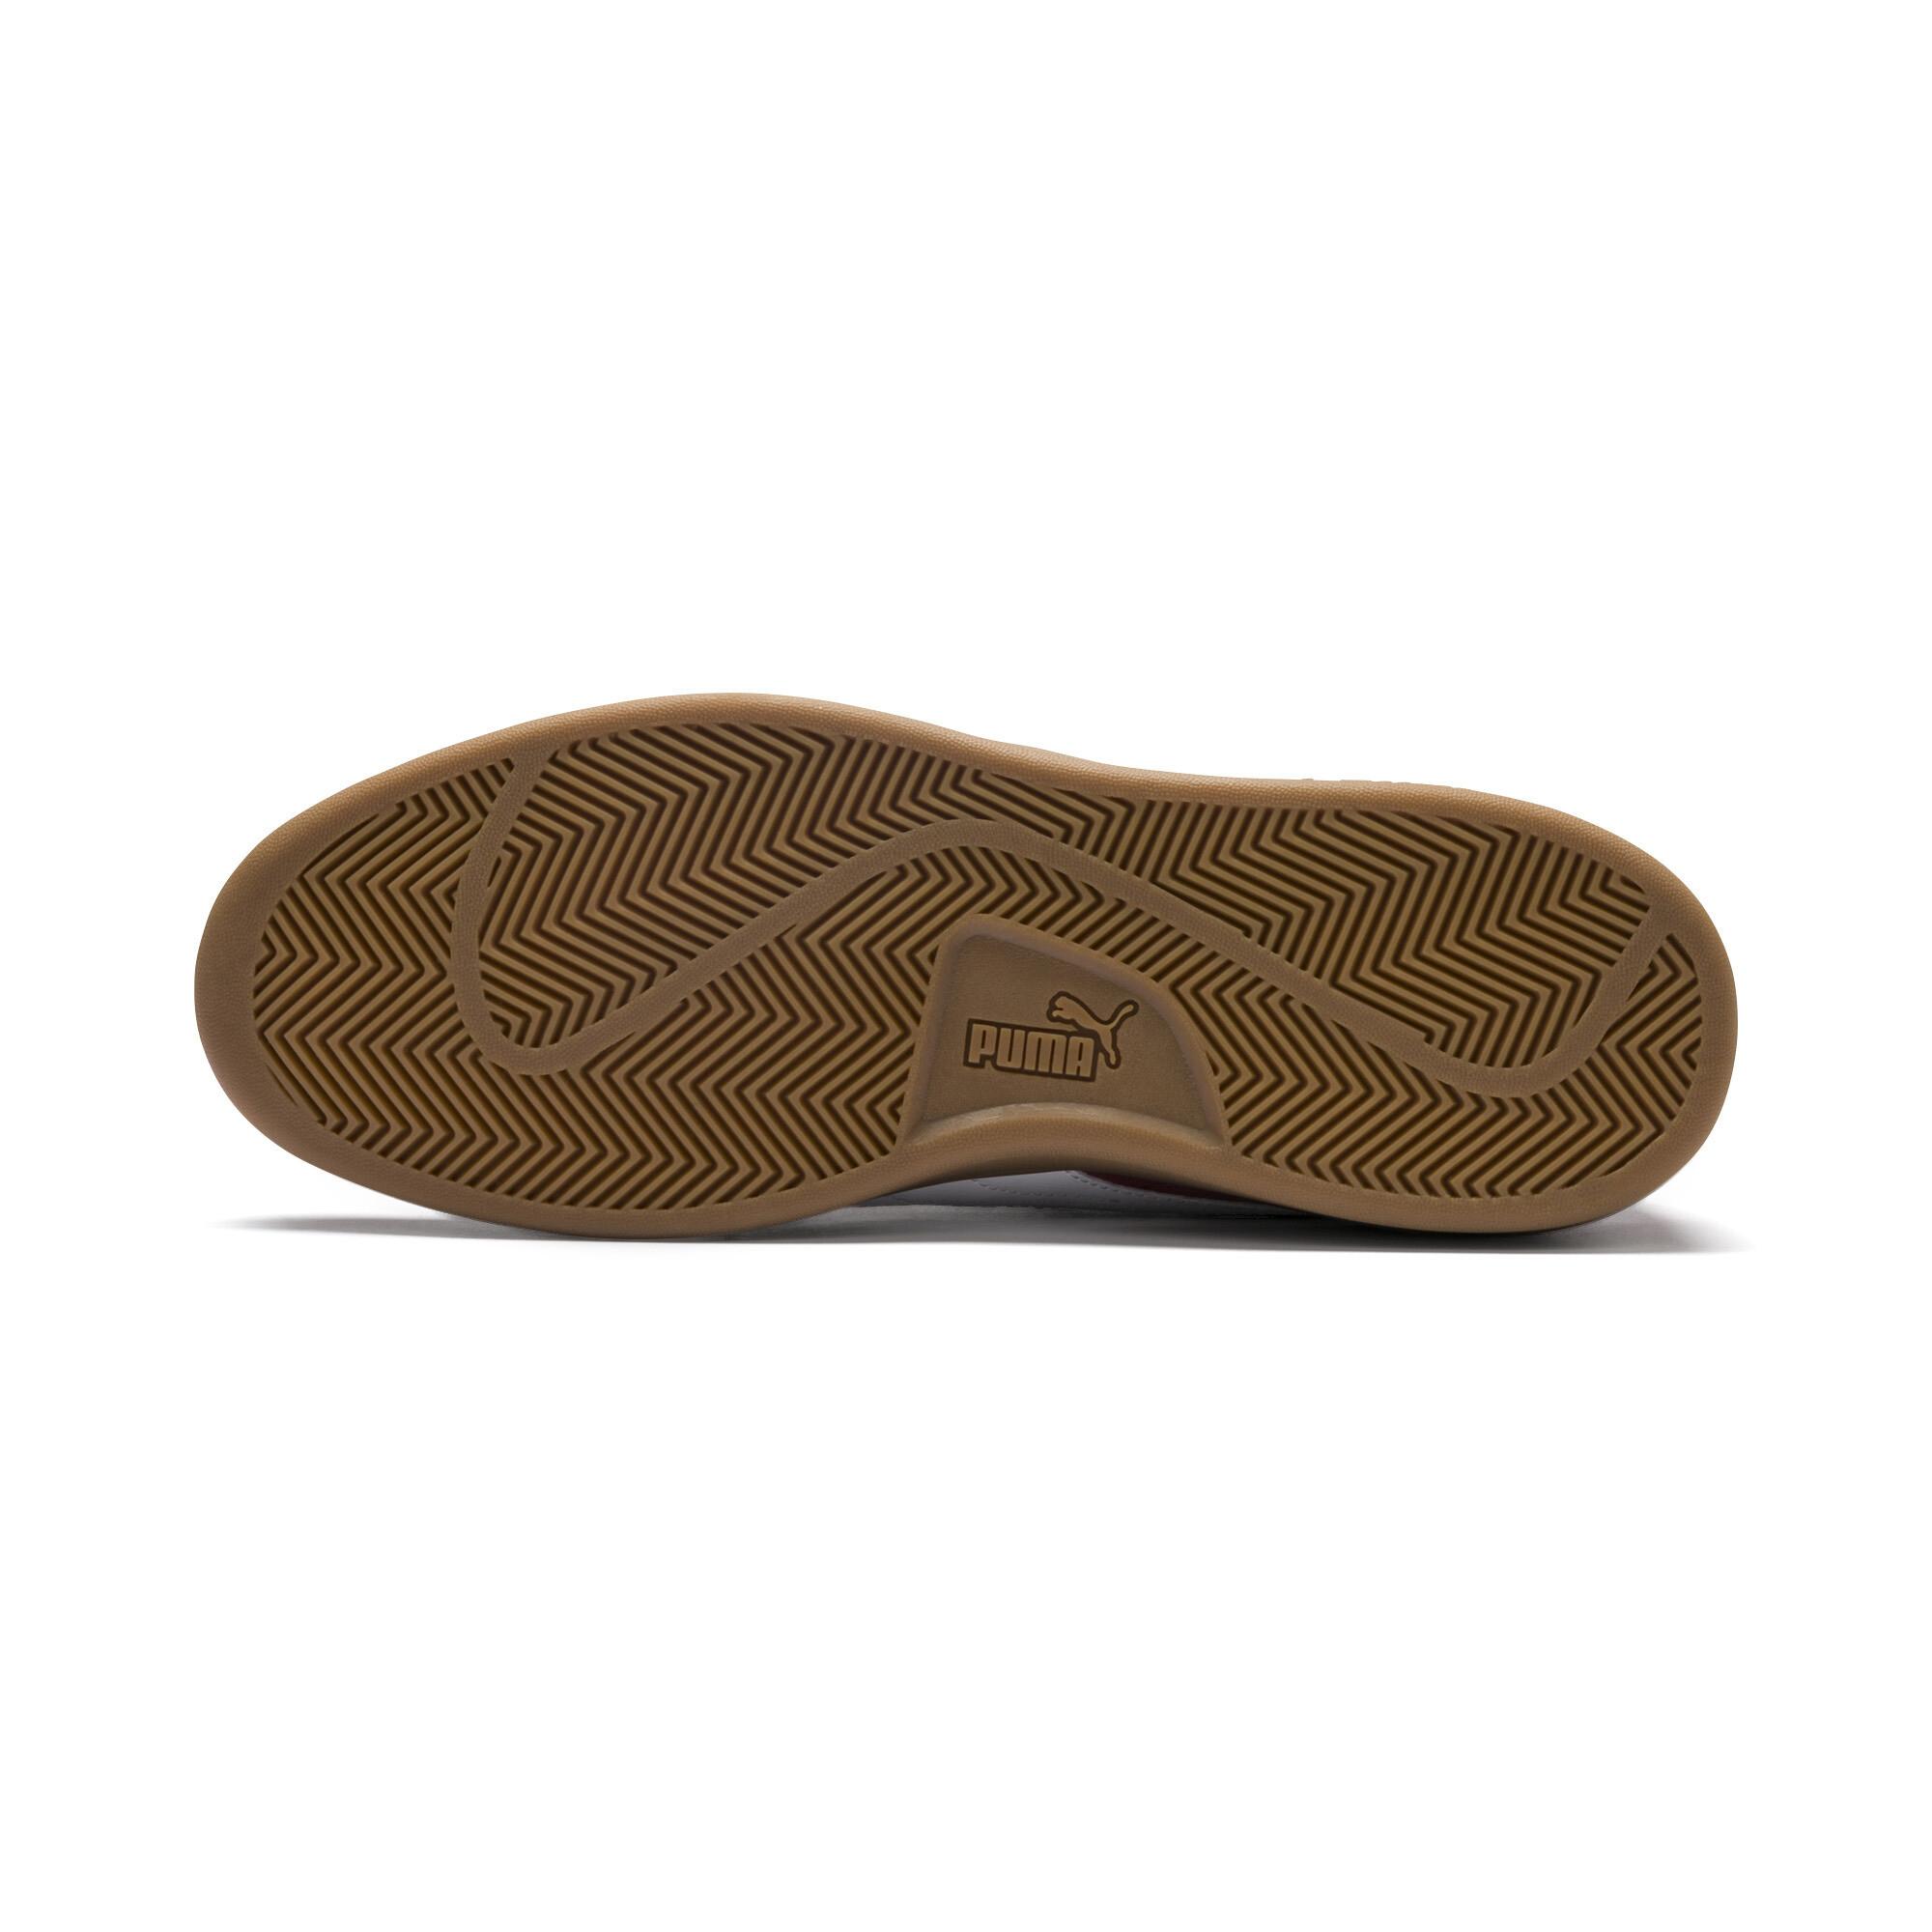 thumbnail 8 - PUMA Men's Astro Kick Sneakers